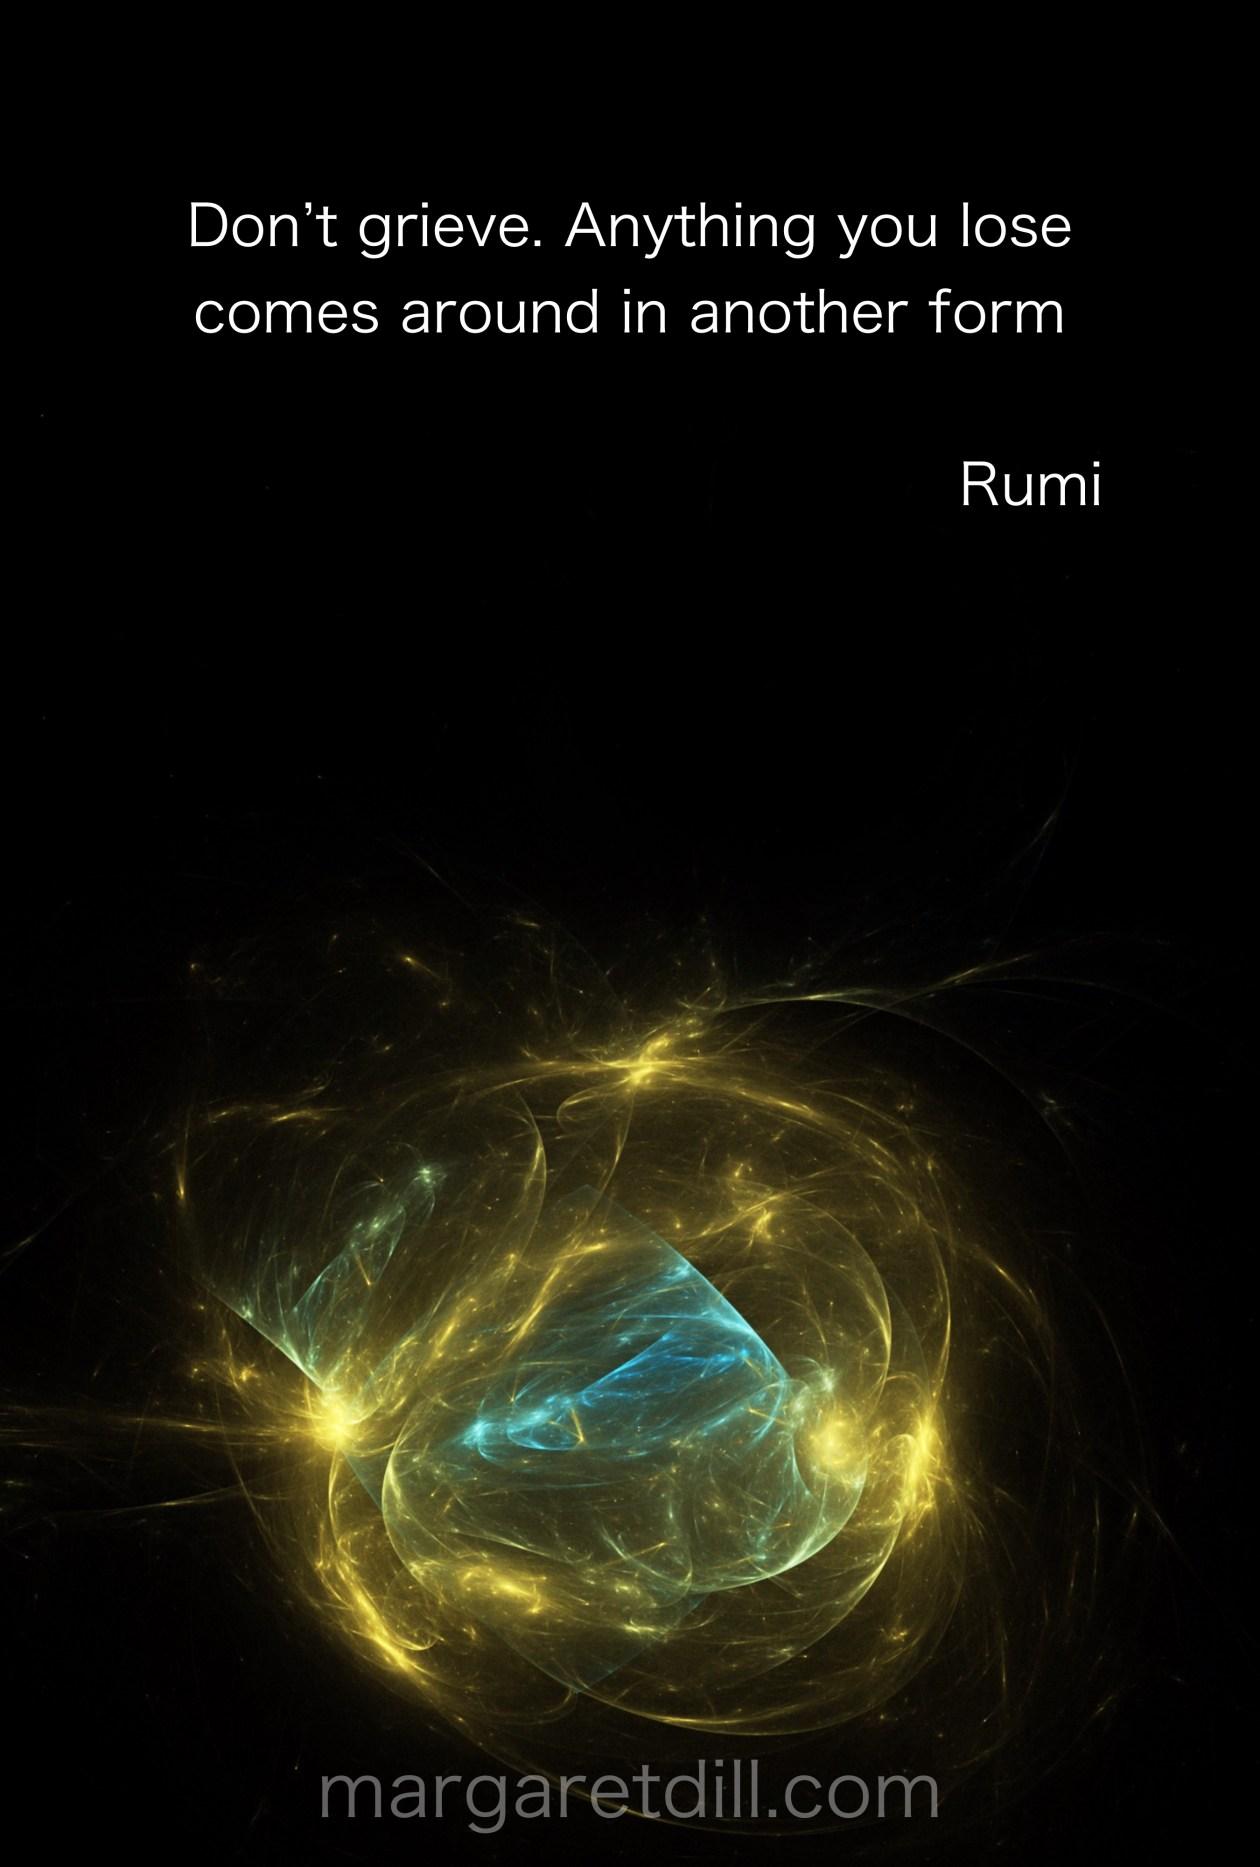 Dont Grieve Rumi Quite #wordstoliveby #mindfulness #meditation #Spiritualawakening #wordsofwisdom #quotations #rumi #rumiquotes